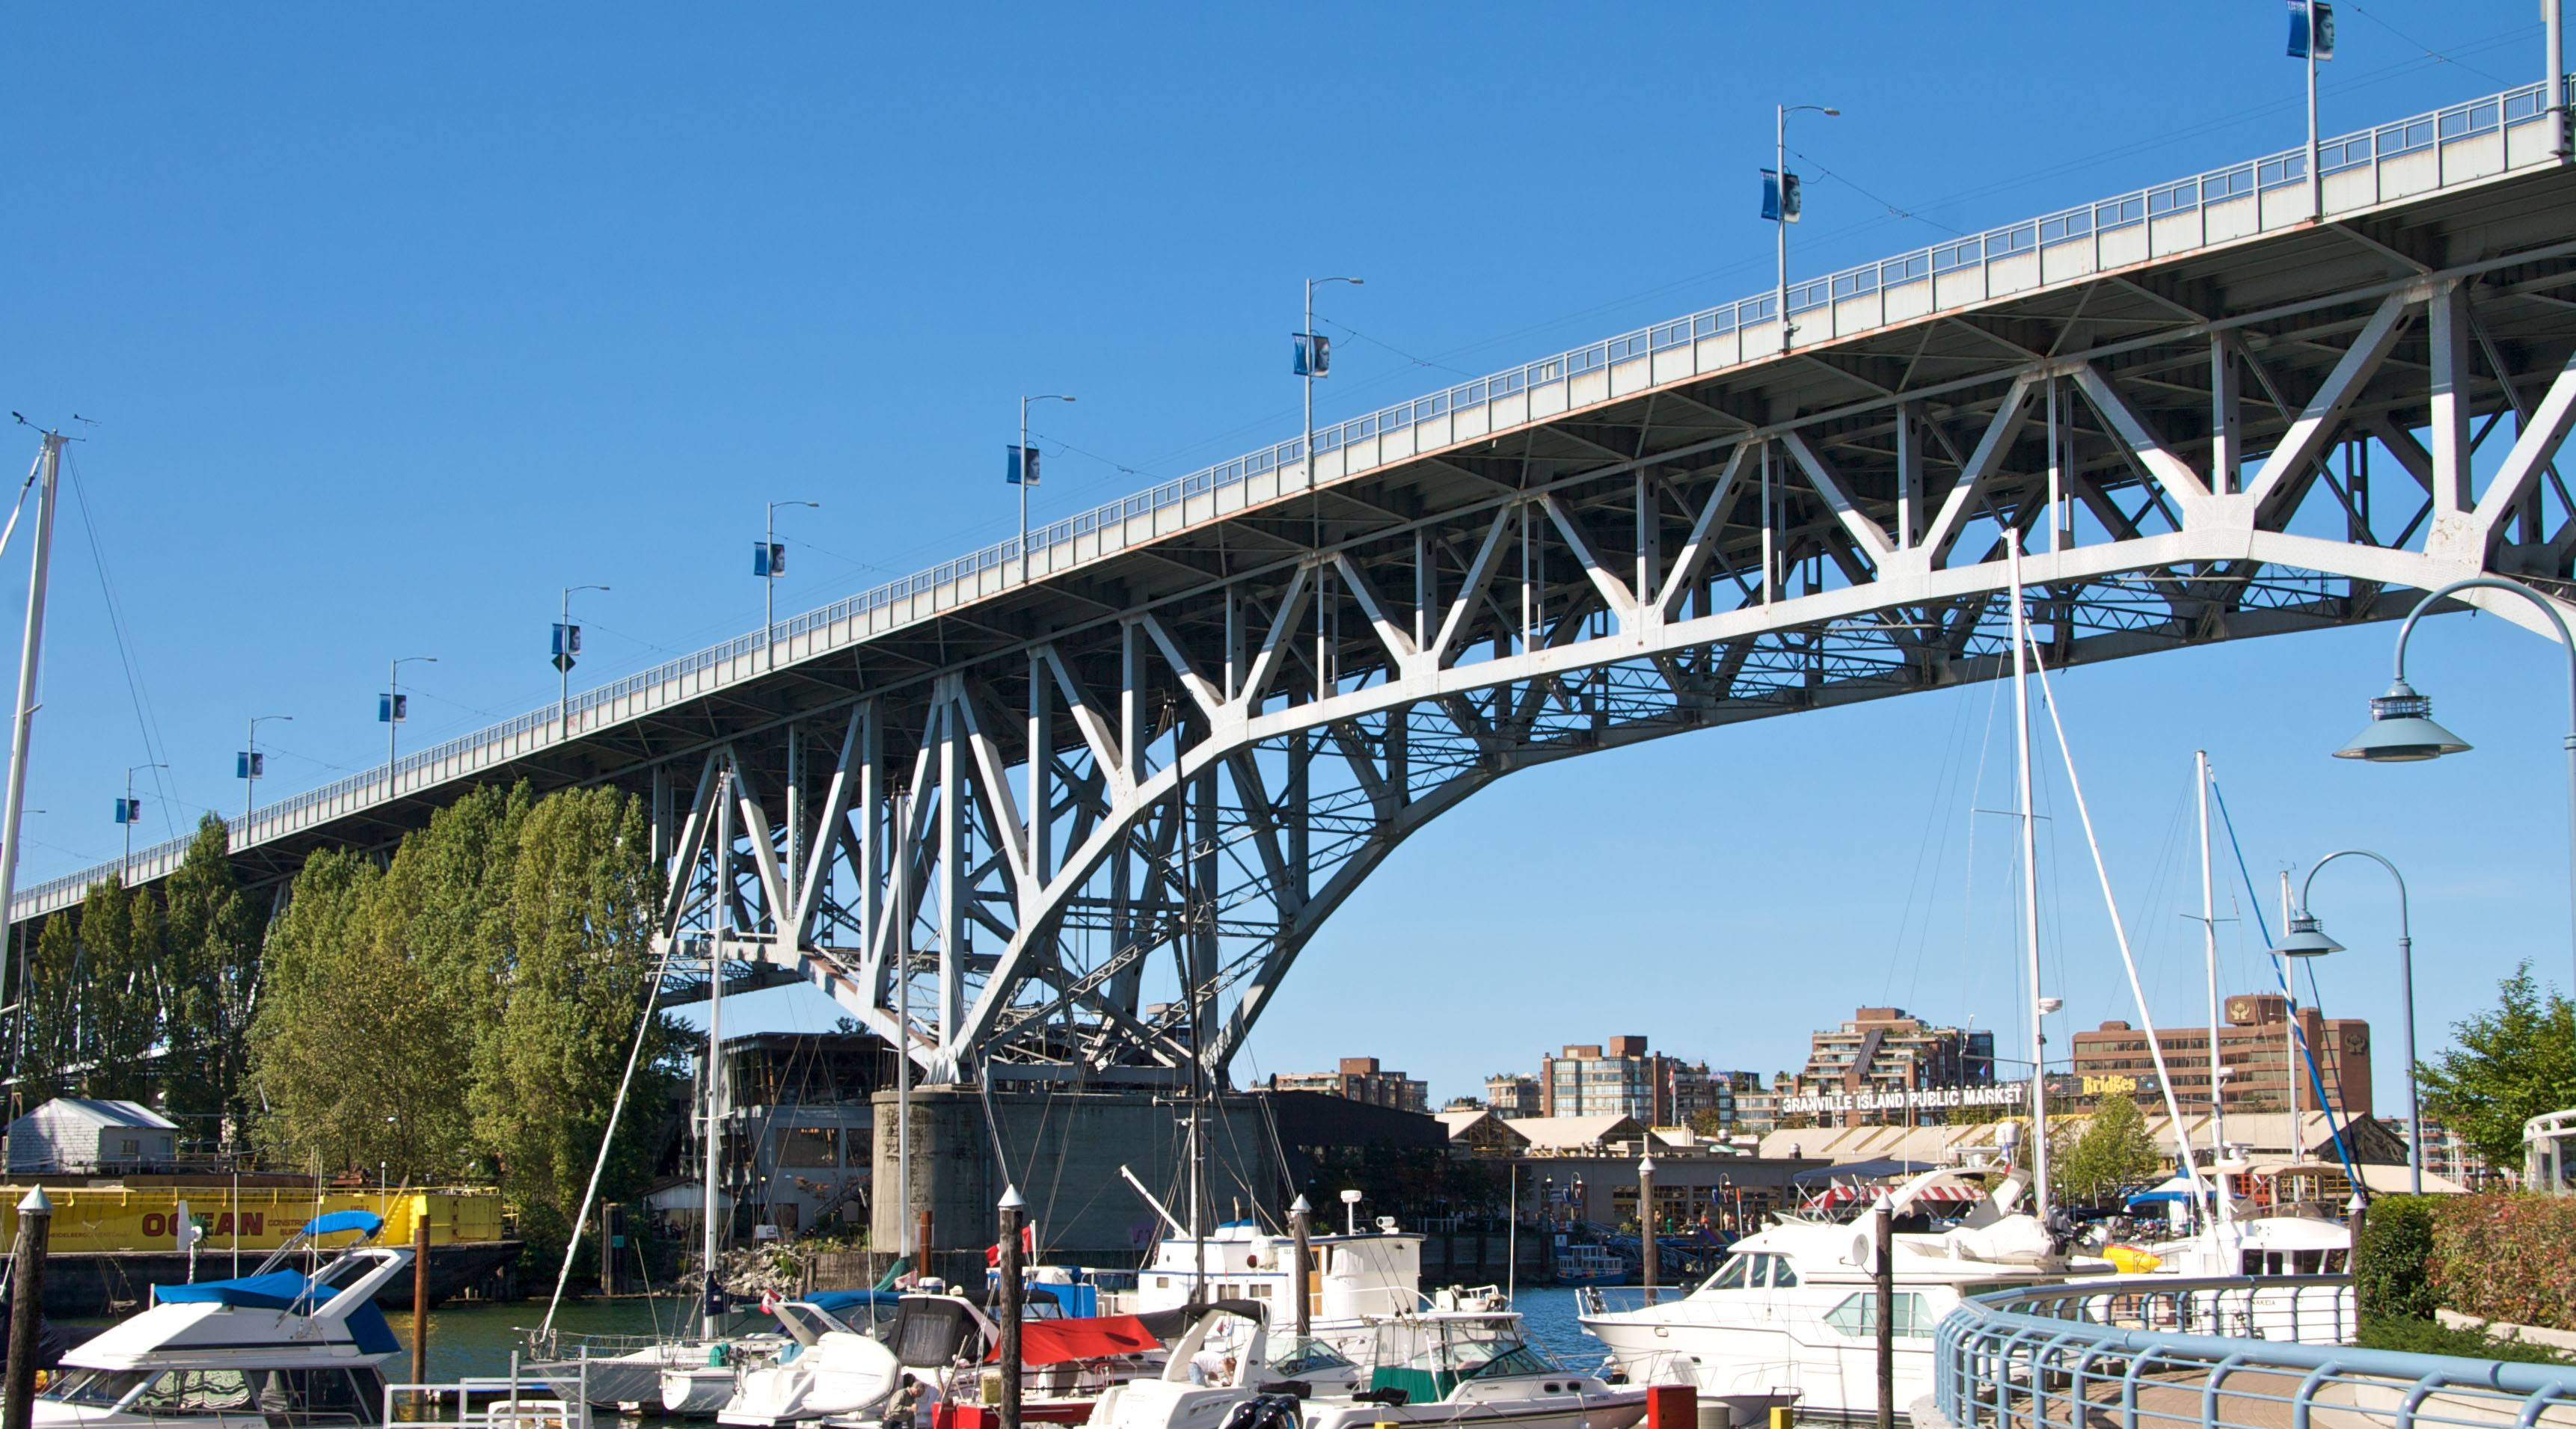 Granville bridge flickr